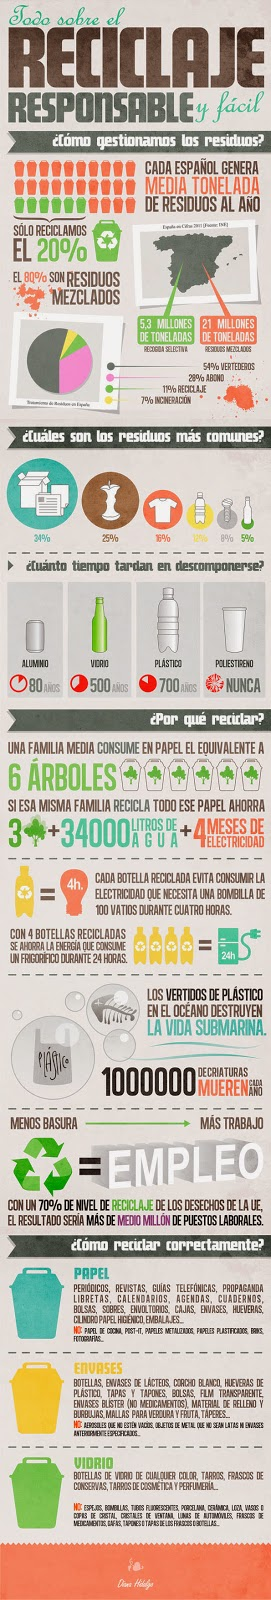 http://ticsyformacion.com/2012/07/23/reciclaje-responsable-infografia-infographic-medioambiente/